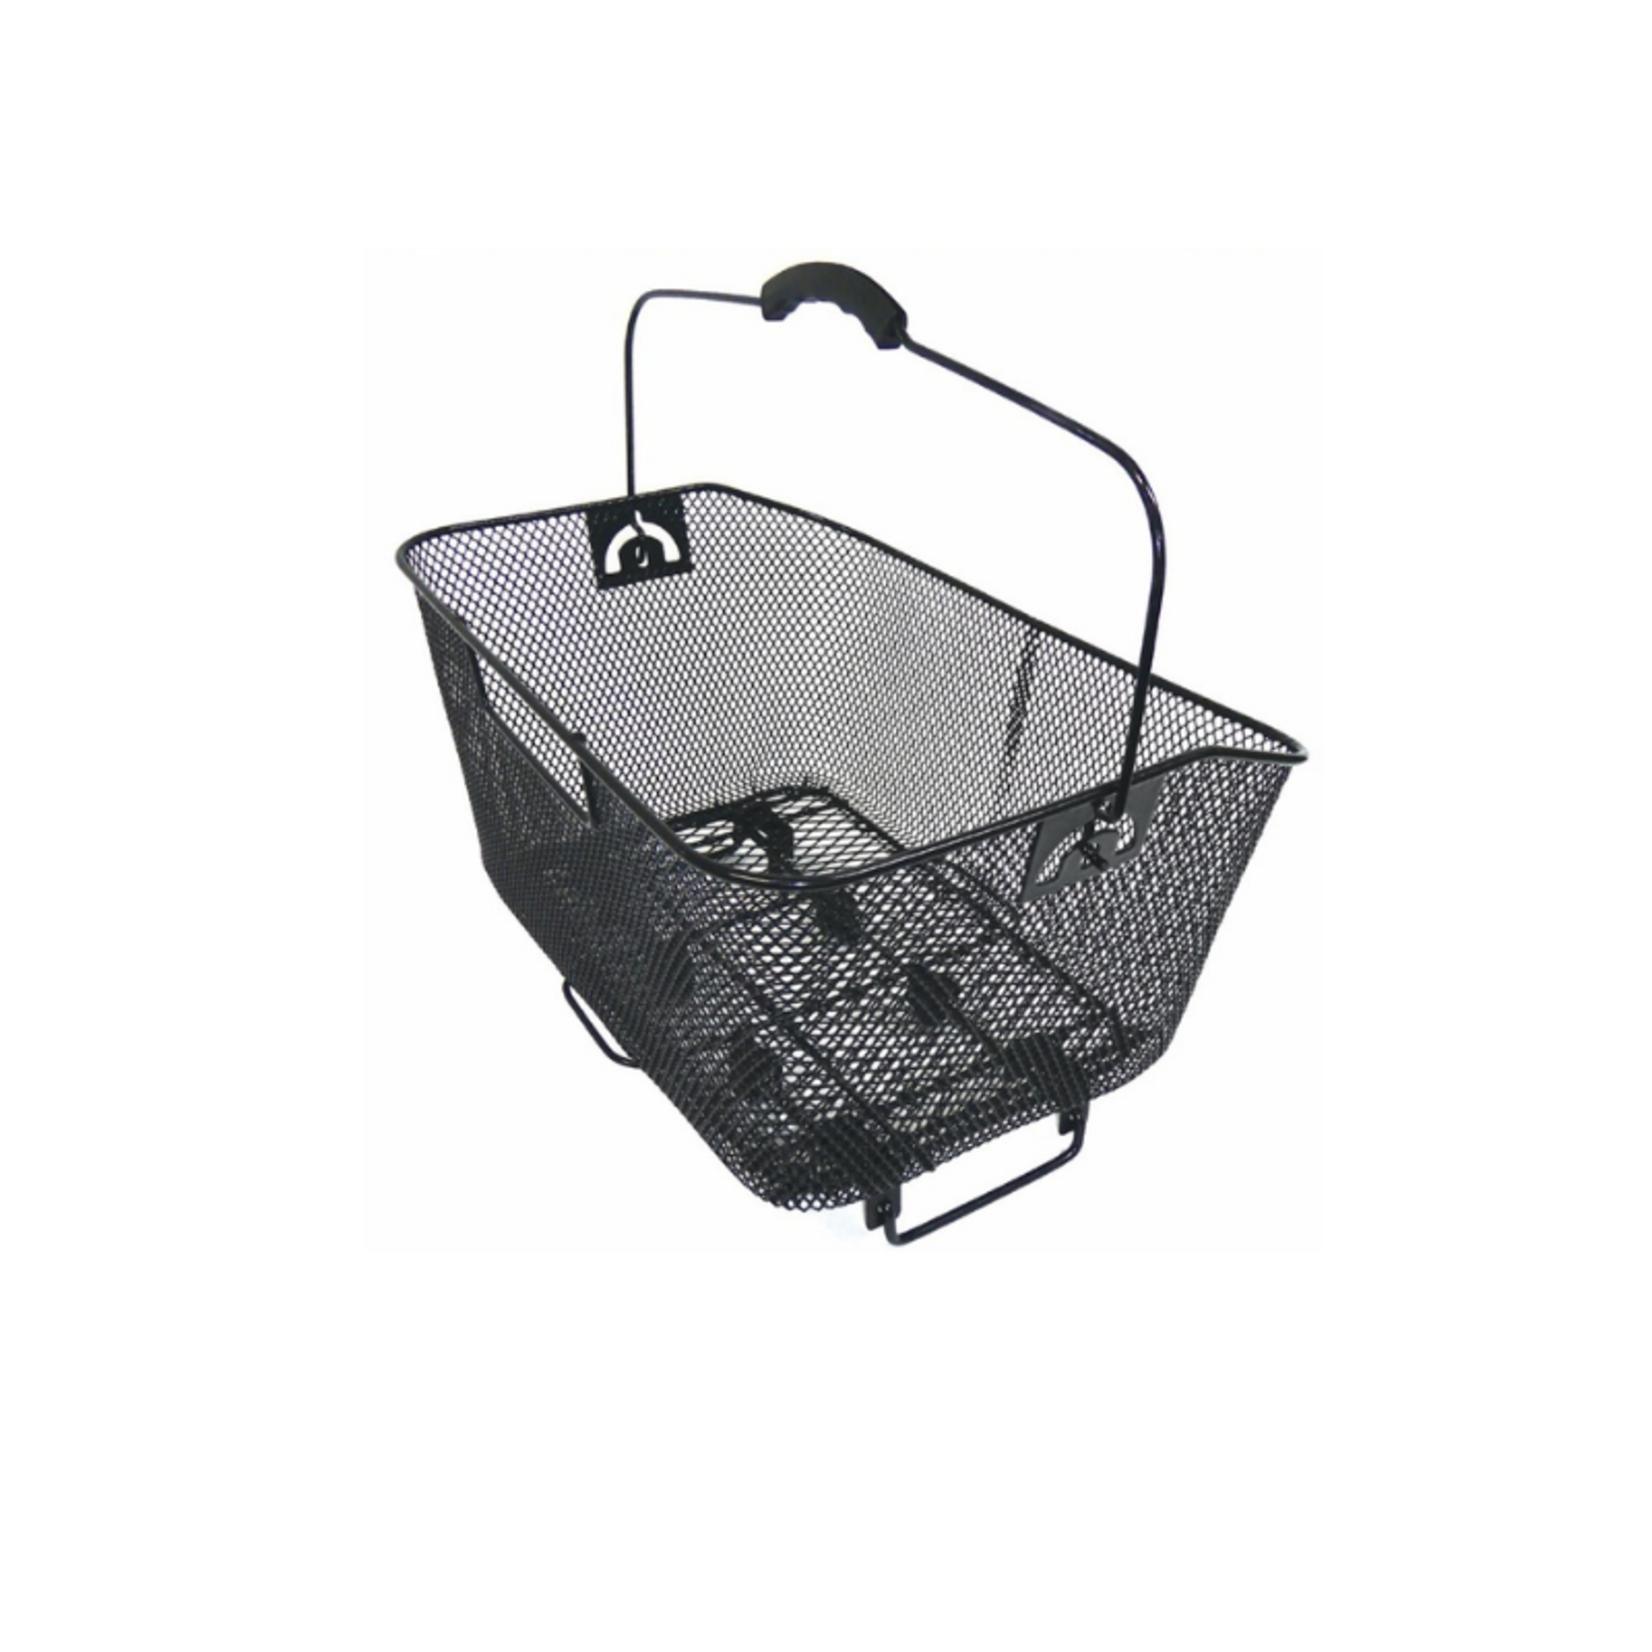 Azur Rear Basket Quick Release Mesh Black